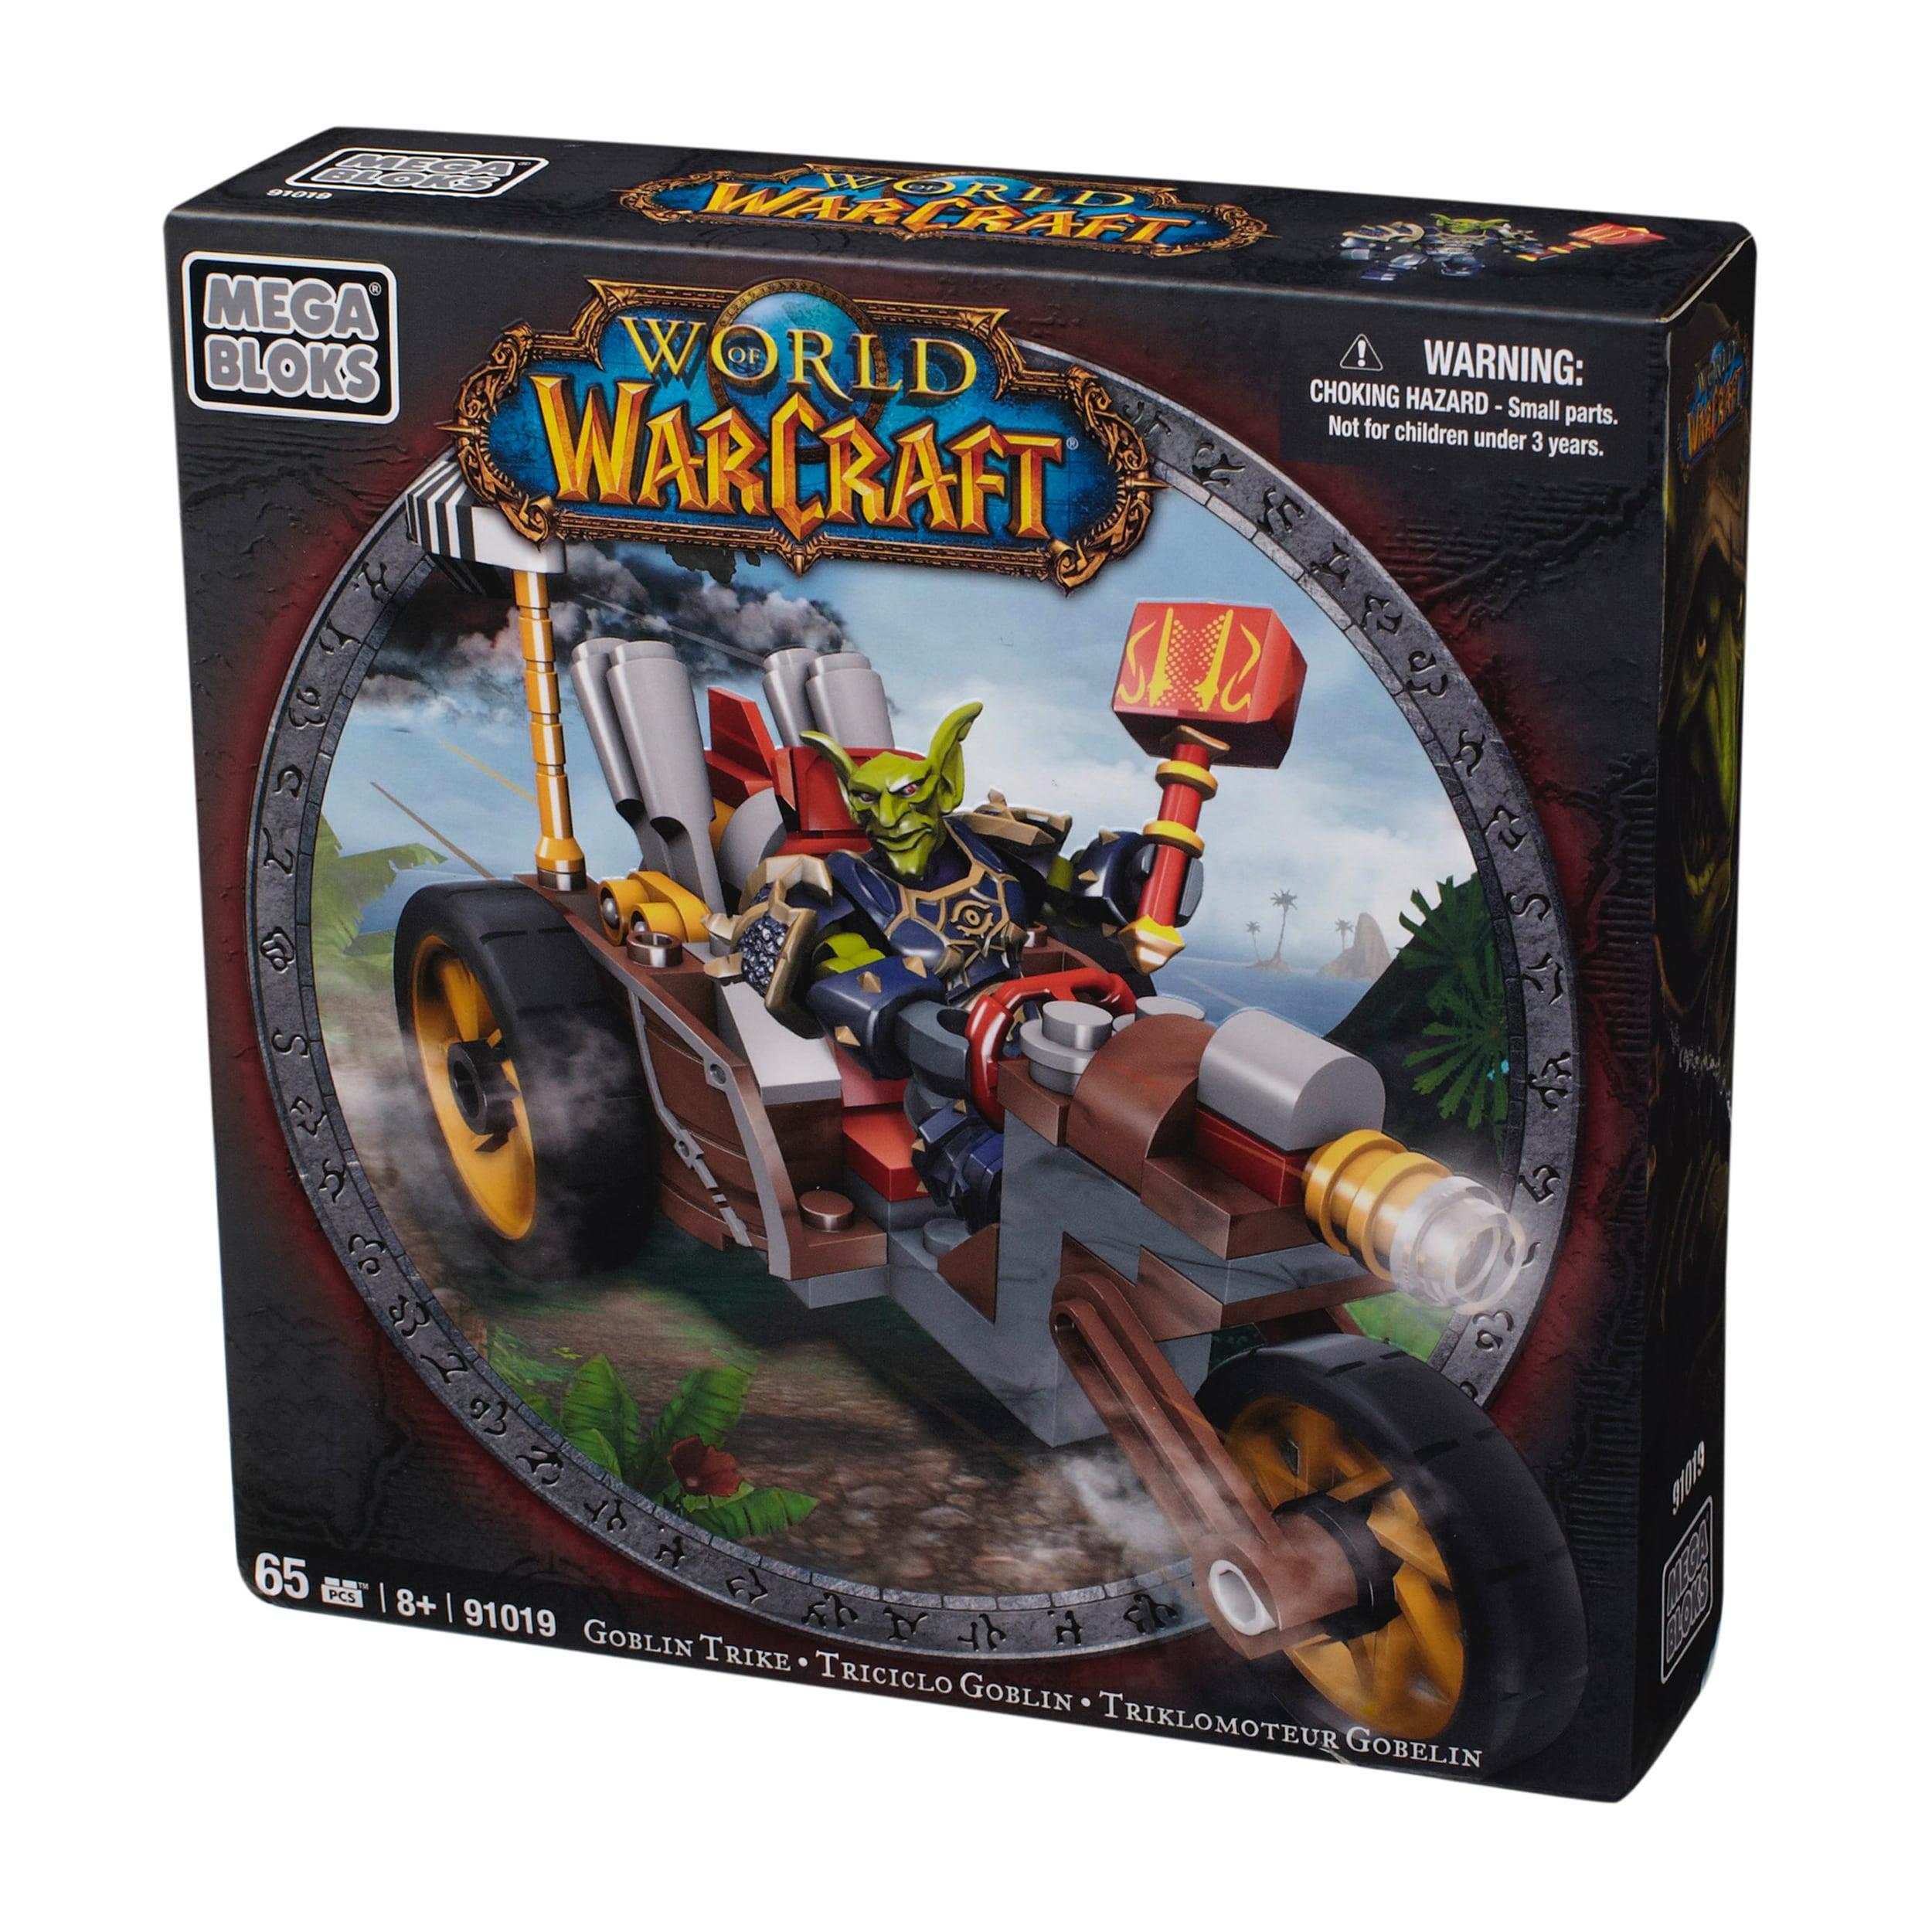 Mega Bloks World of Warcraft Goblin Trike and Pitz Playset